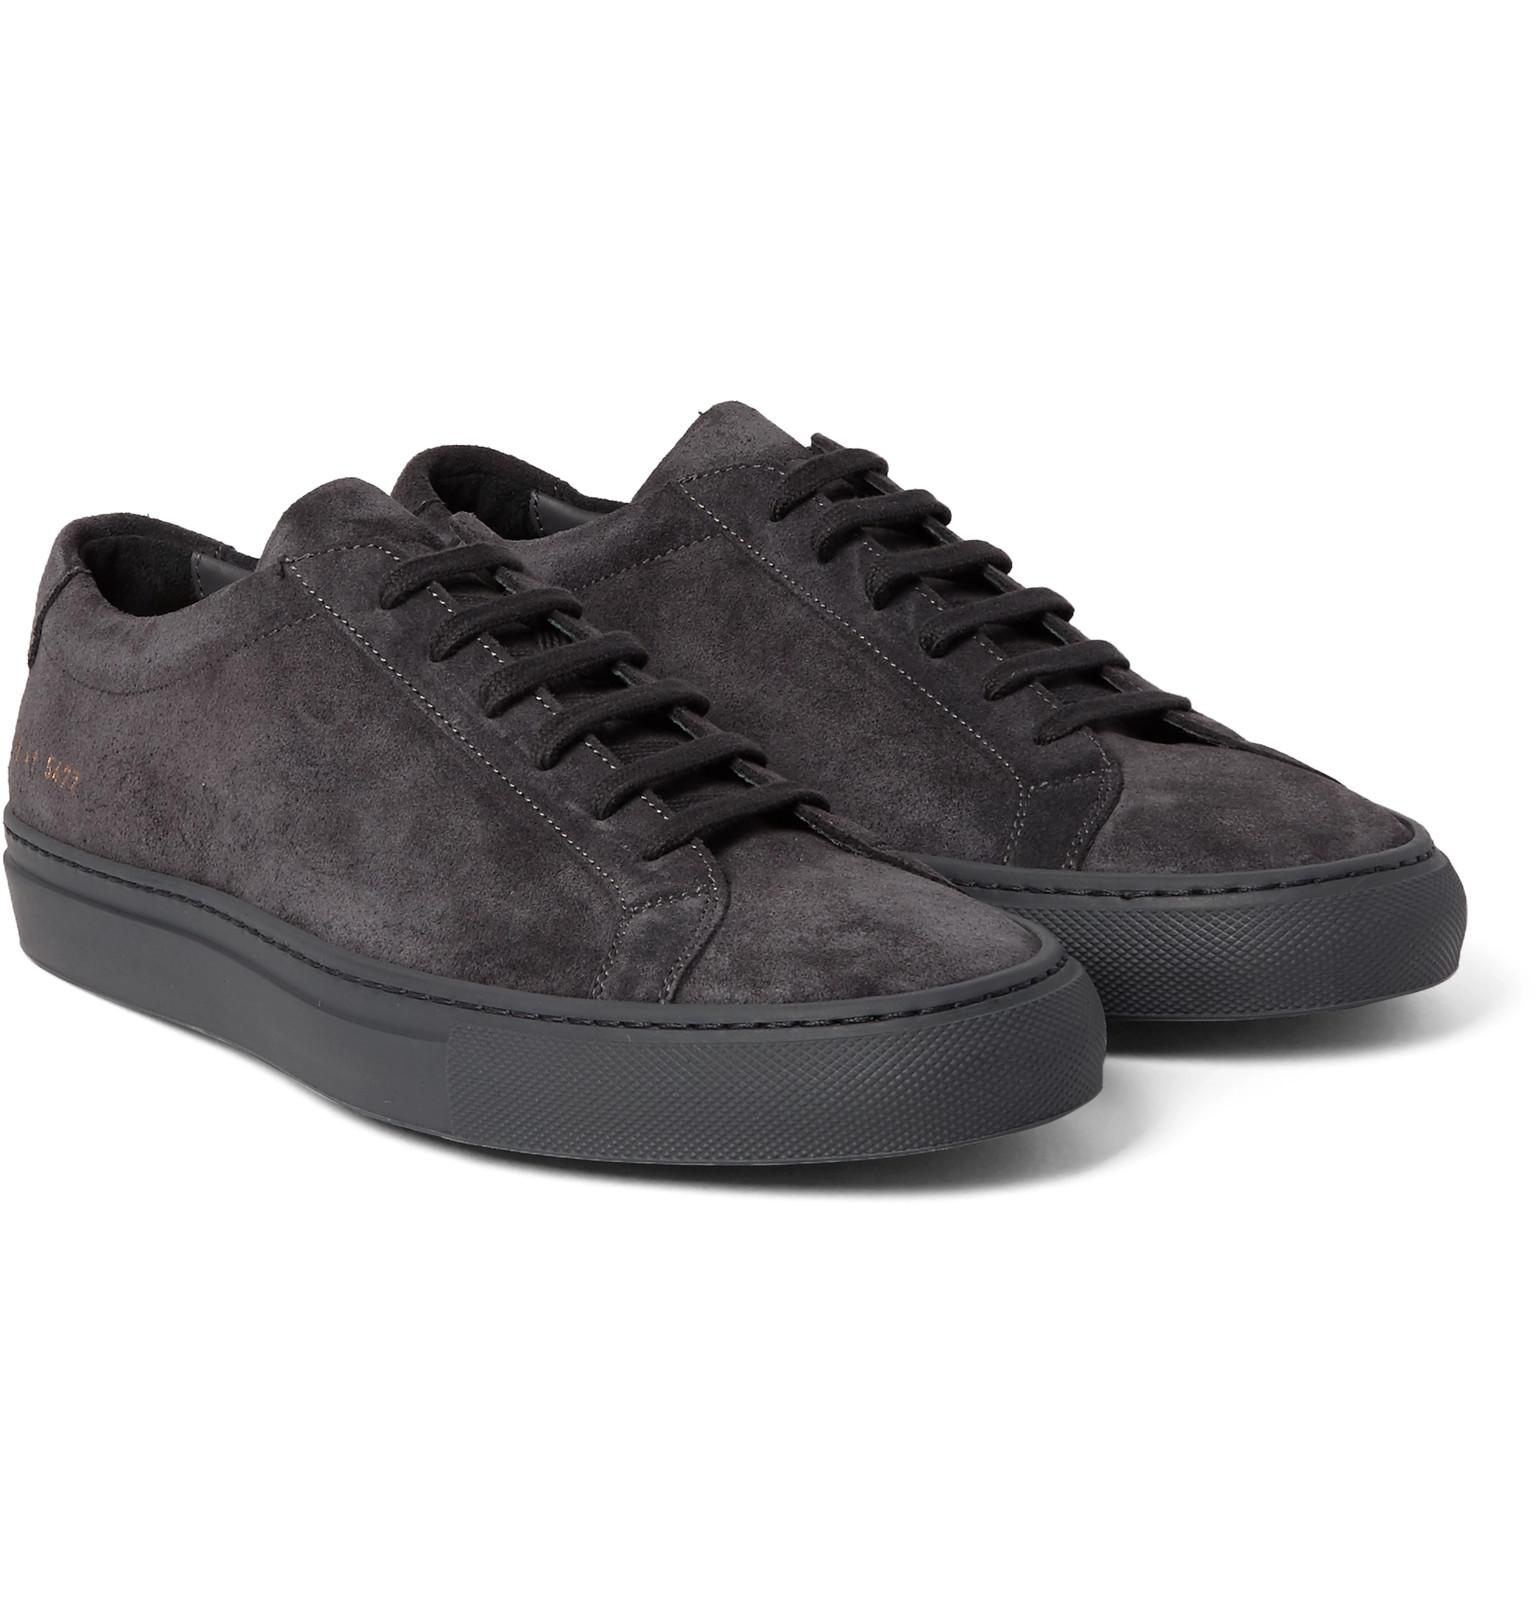 NMD R1 PK Winter Wool Core Black Shoes